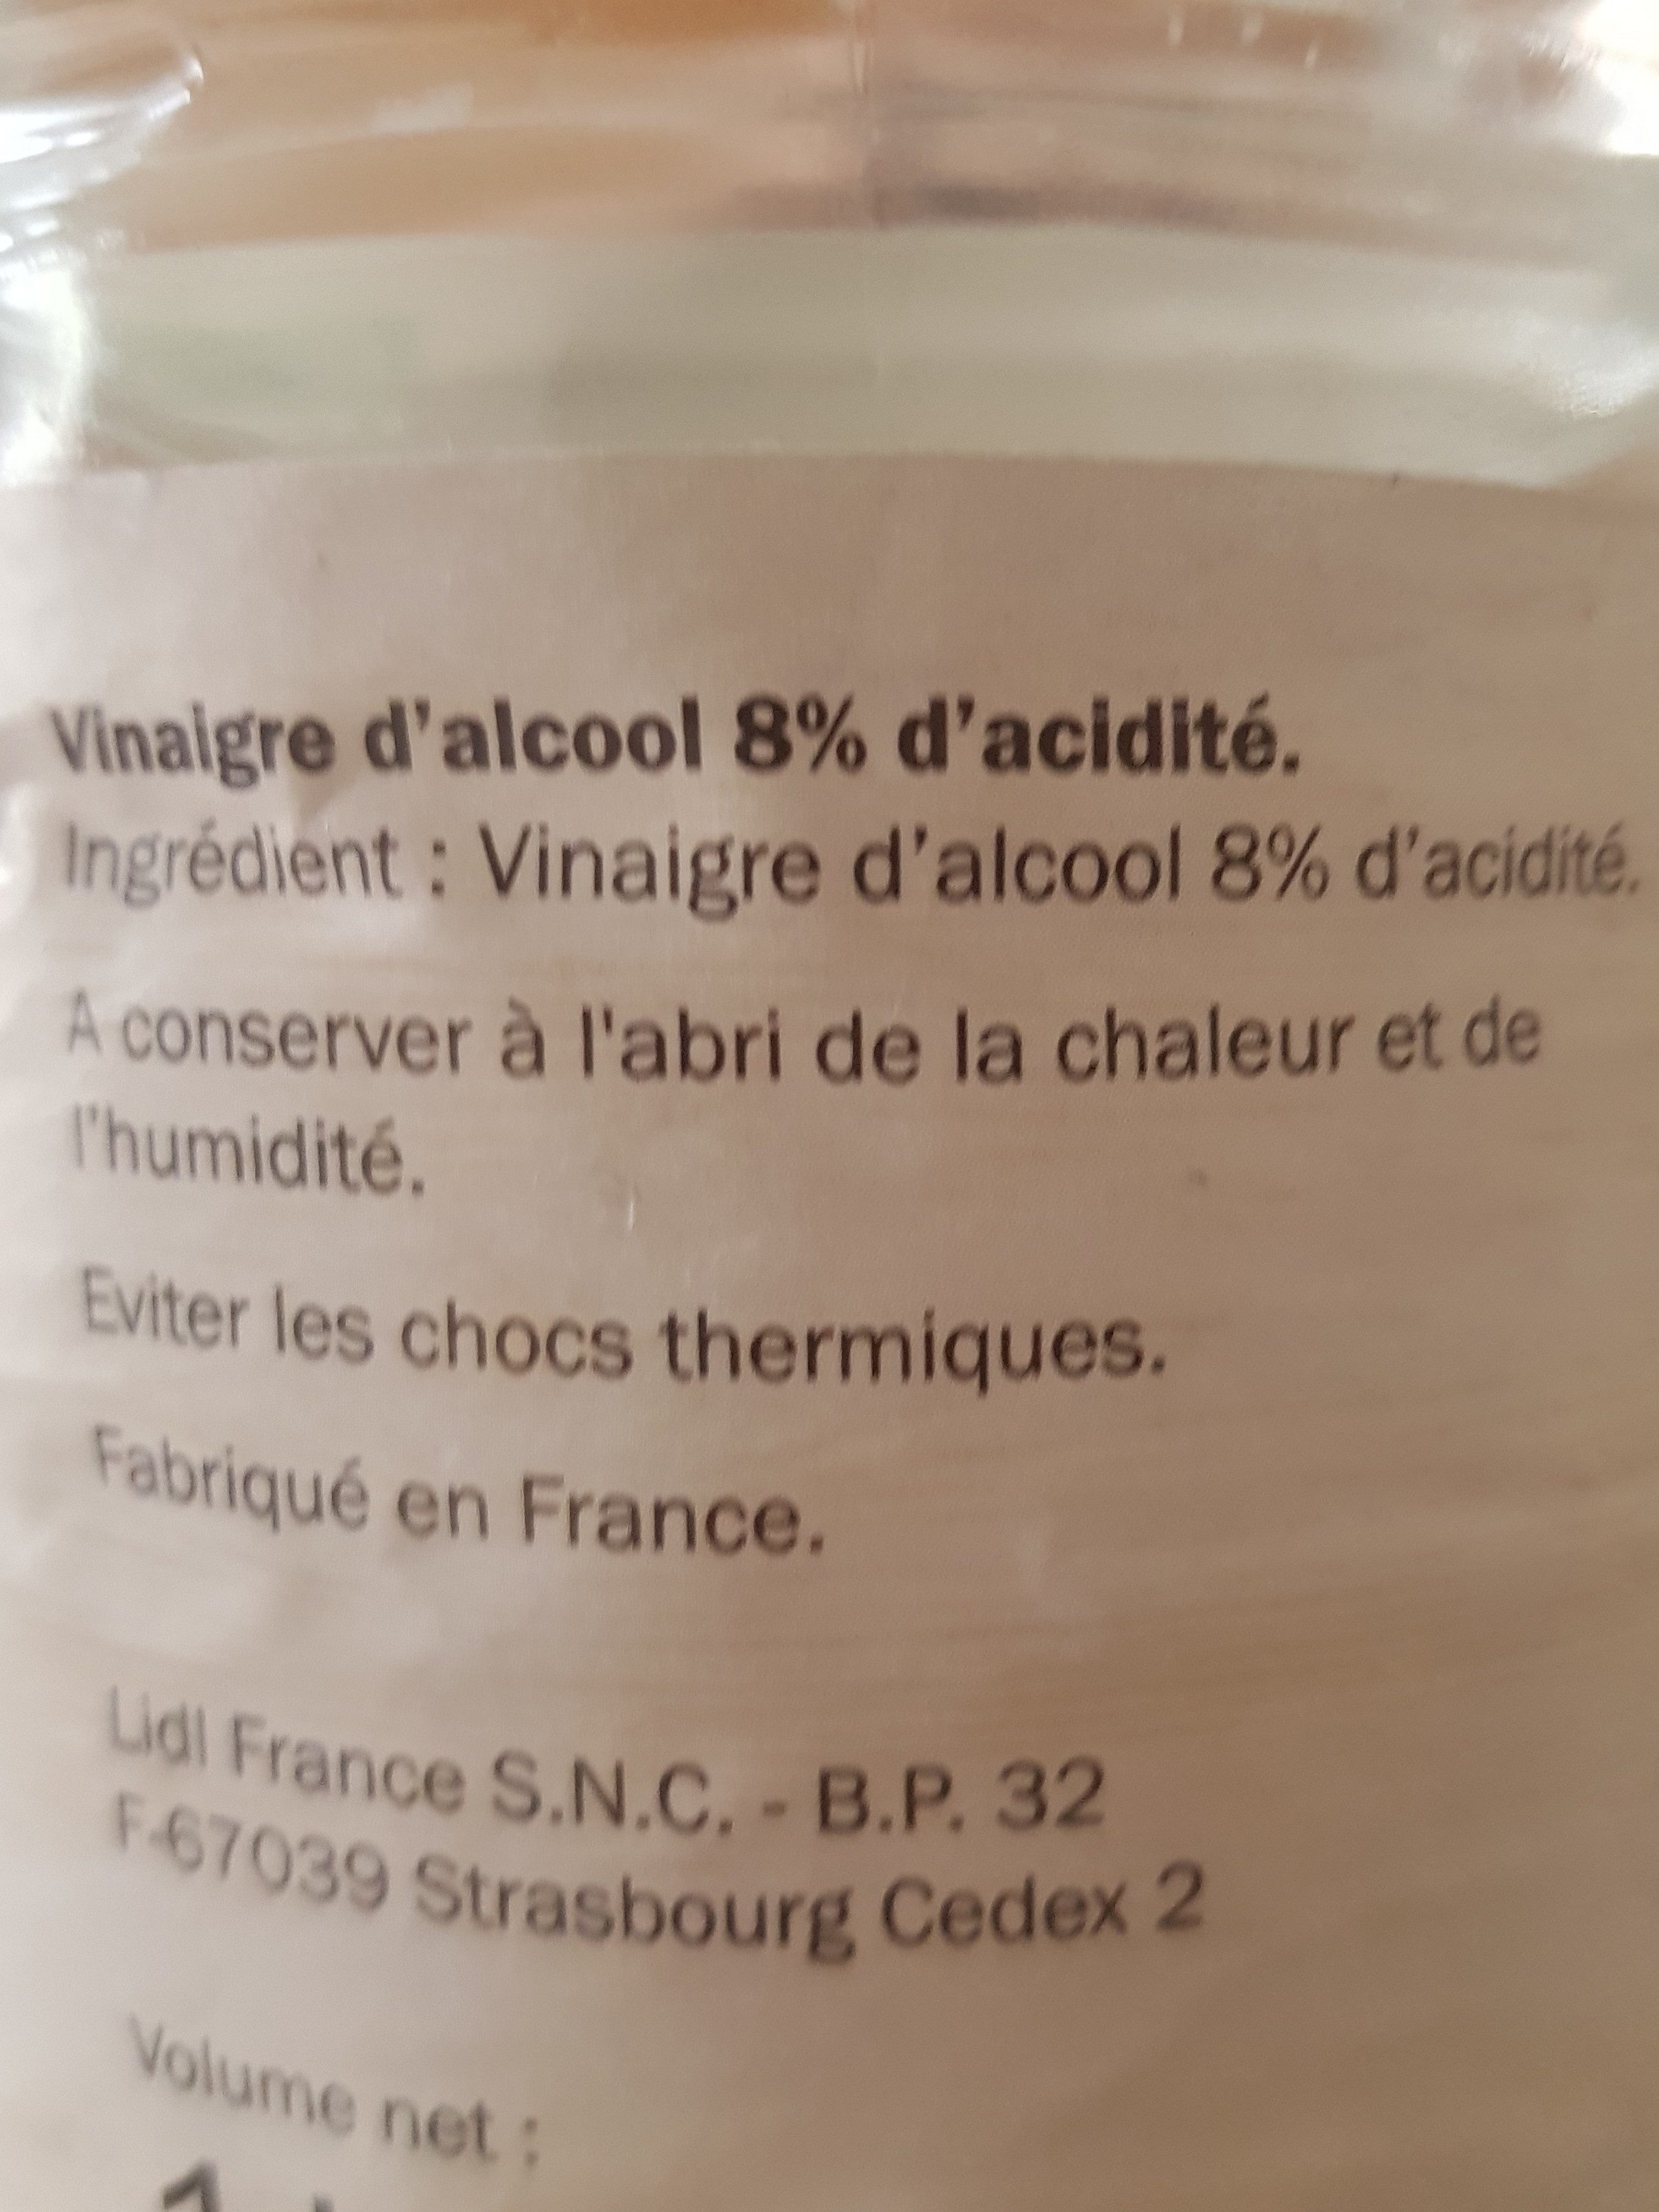 Vinaigre cristal - Ingrediënten